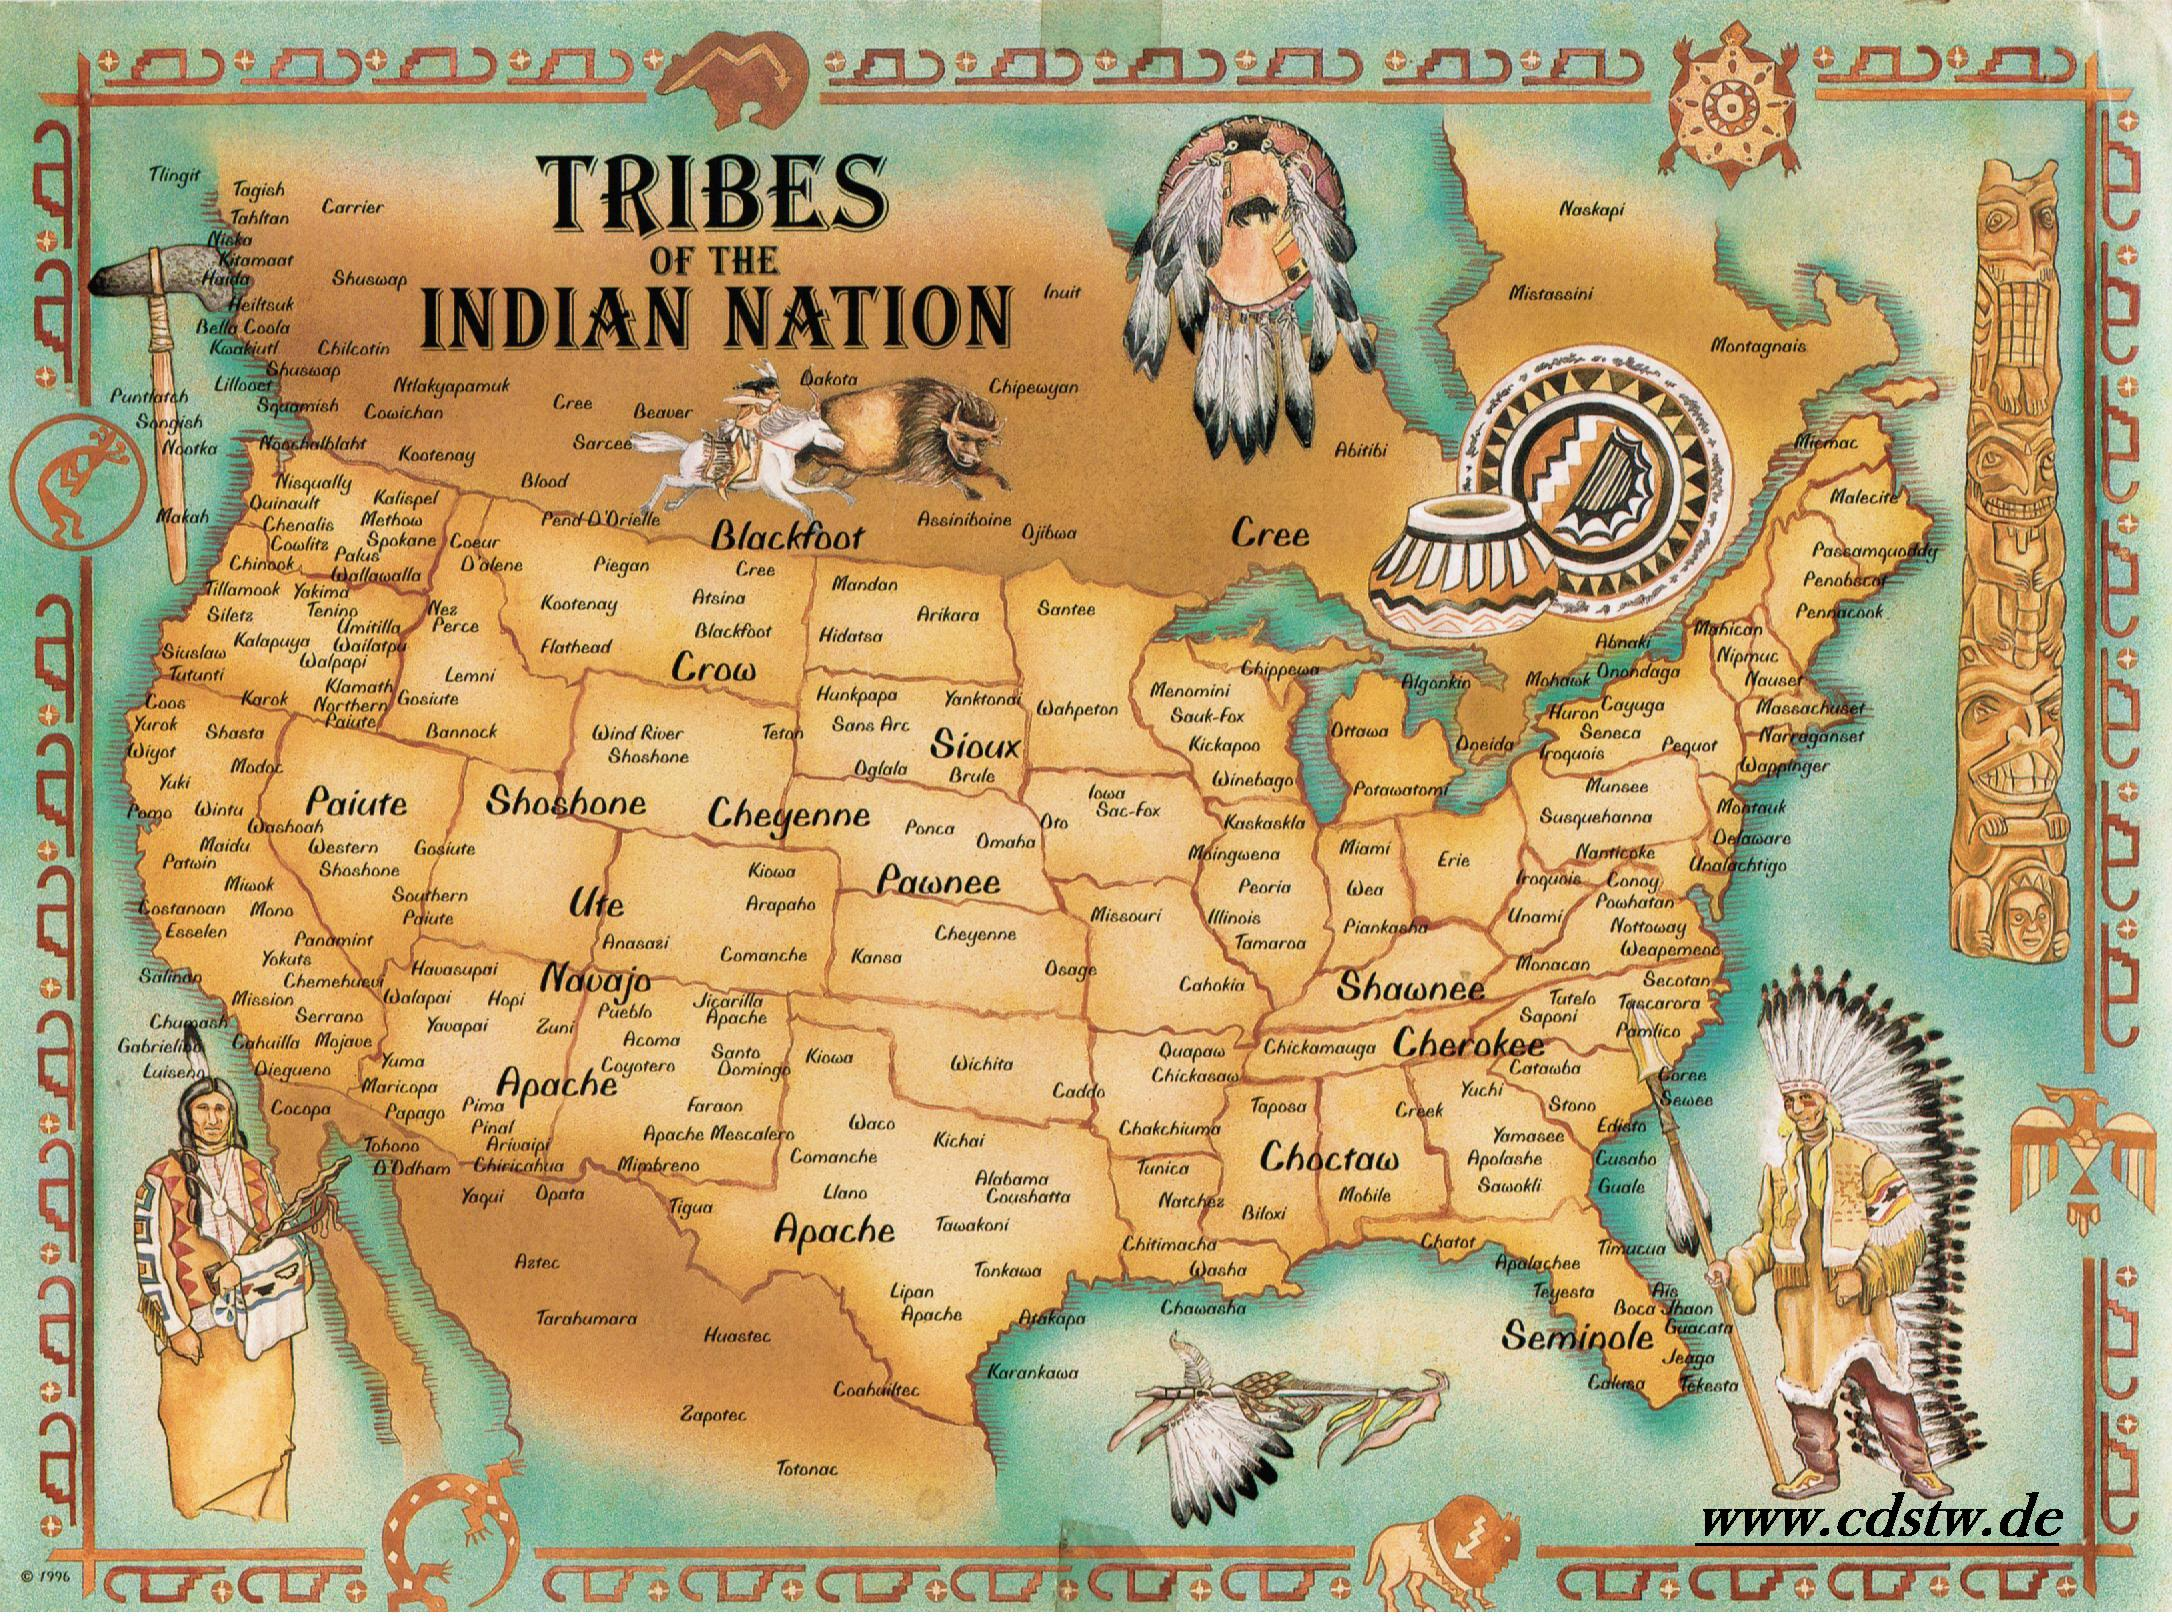 Indianerstamme Nordamerikas Karte.Indianerstamme Nordamerika Karte Filmgroephetaccent